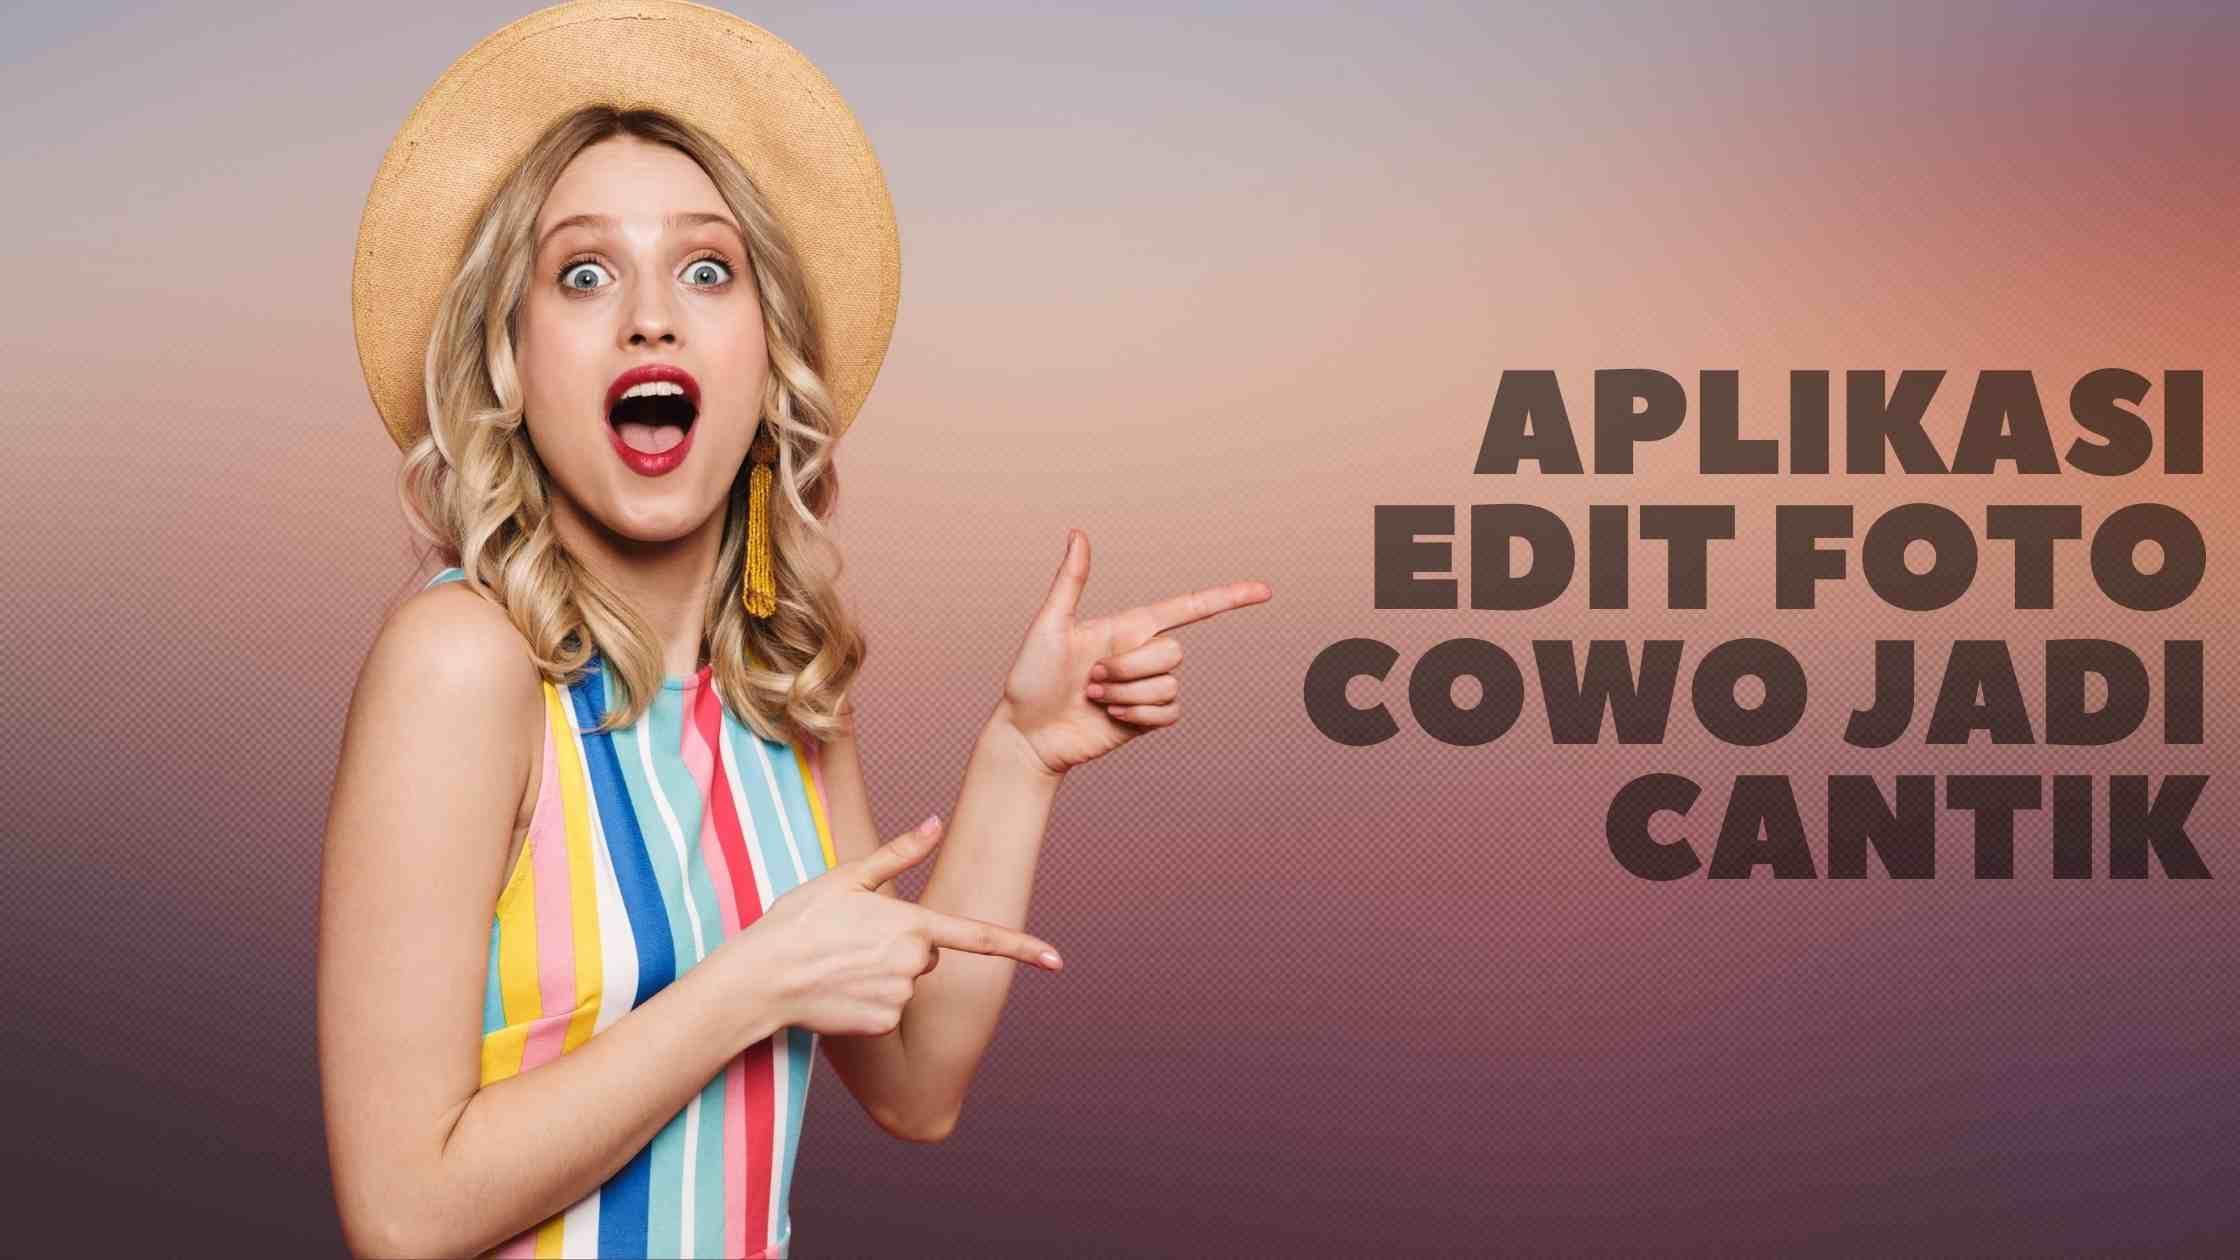 Aplikasi Edit Foto Cowok Jadi Cantik Di 2021 Pengeditan Foto Aplikasi Kecantikan